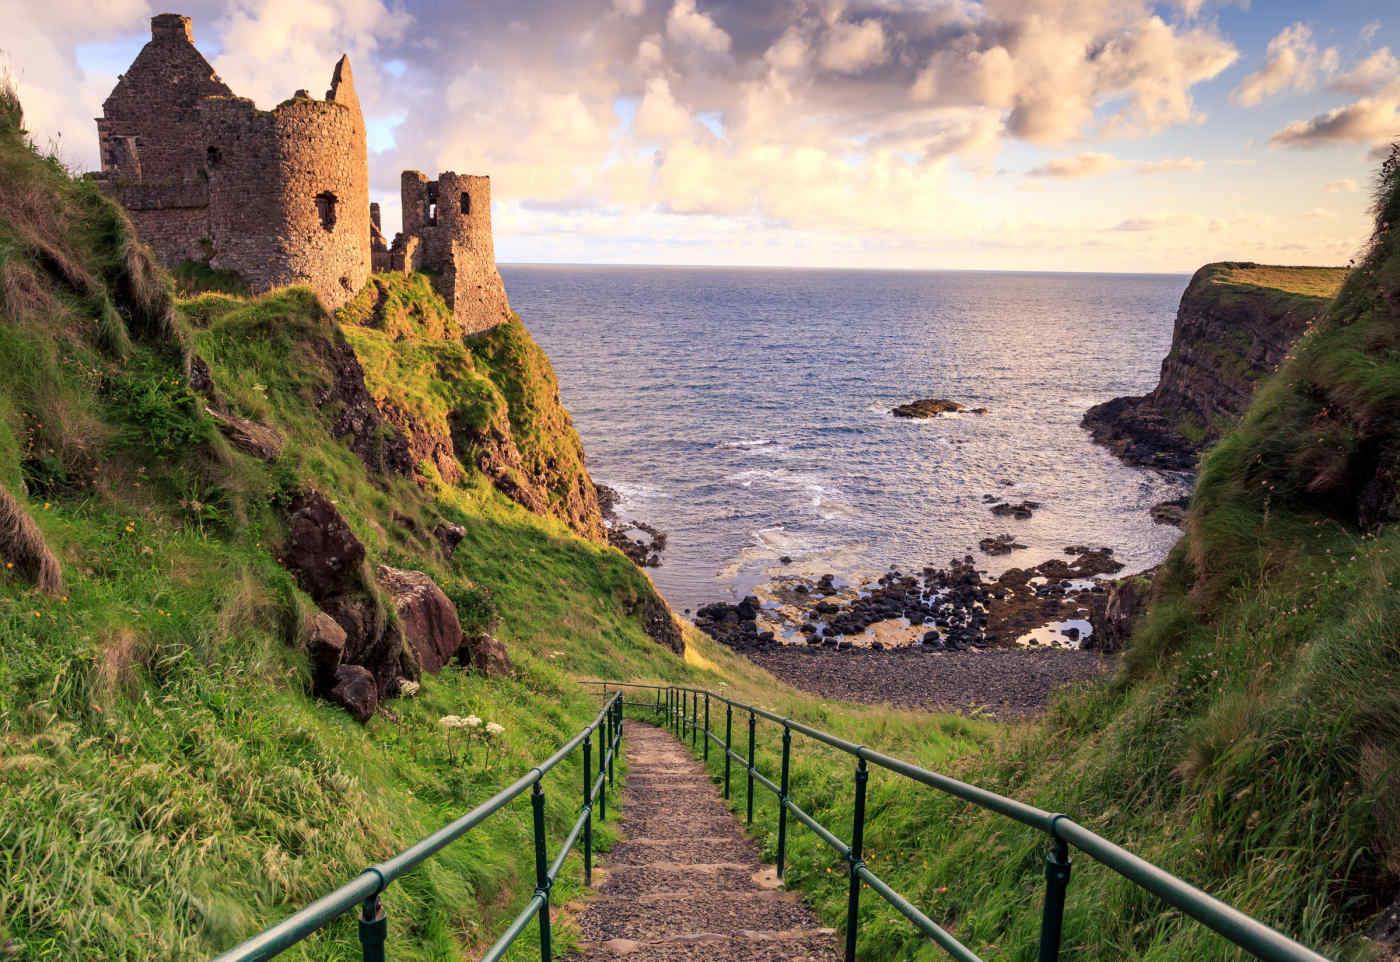 Dunluce Castle in Bushmills, Northern Ireland